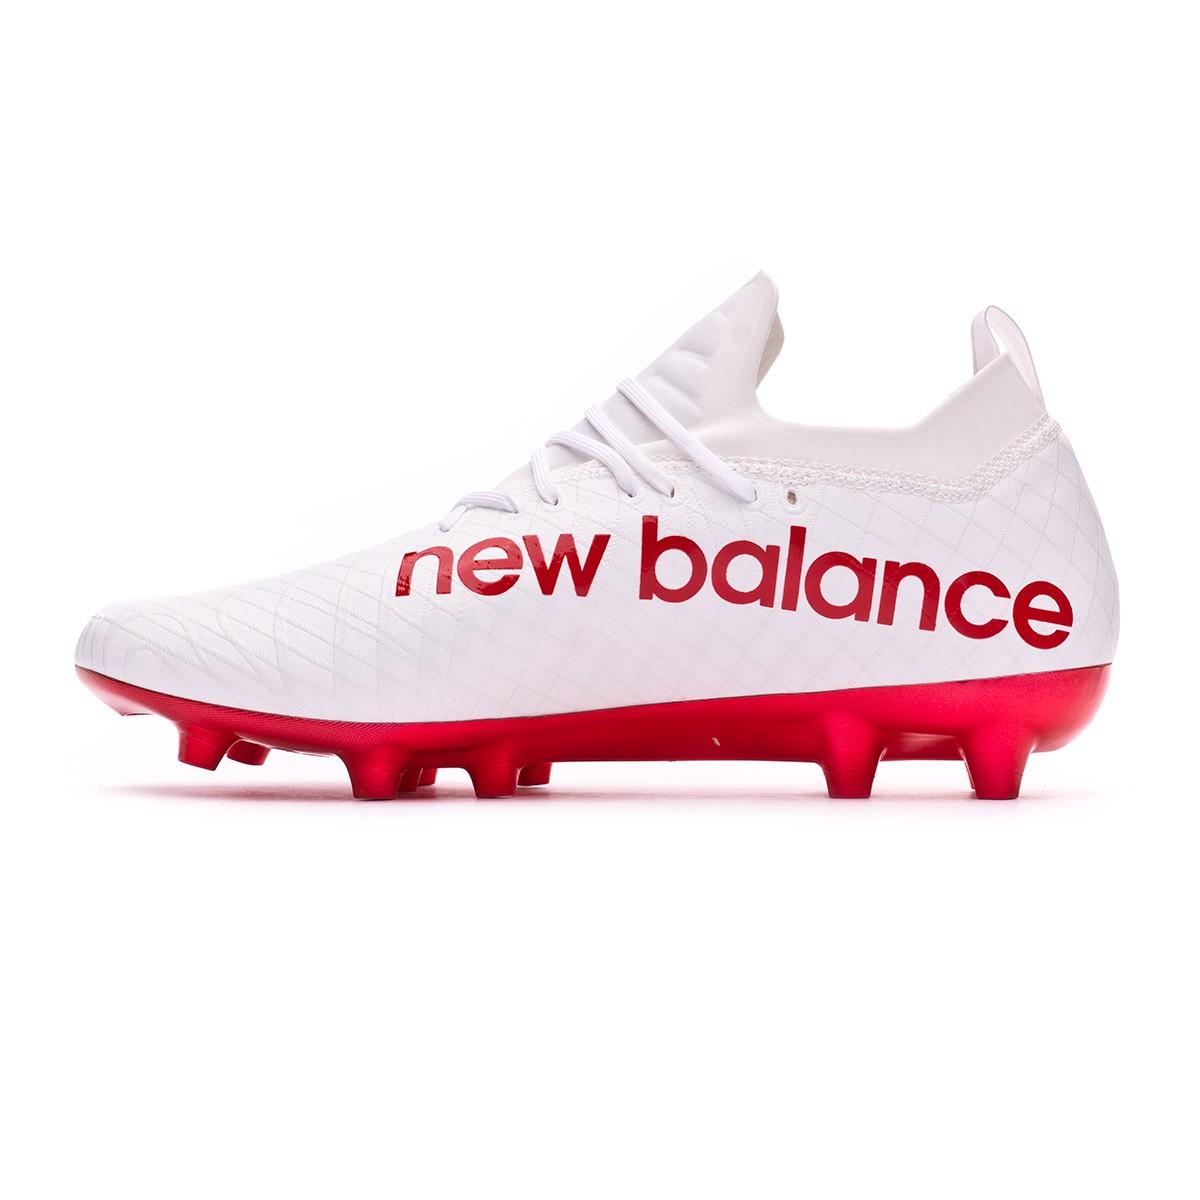 promo code 408c1 2ab8b Chaussure de foot New Balance Tekela PRO FG Blanc-Rouge - Boutique de  football Fútbol Emotion